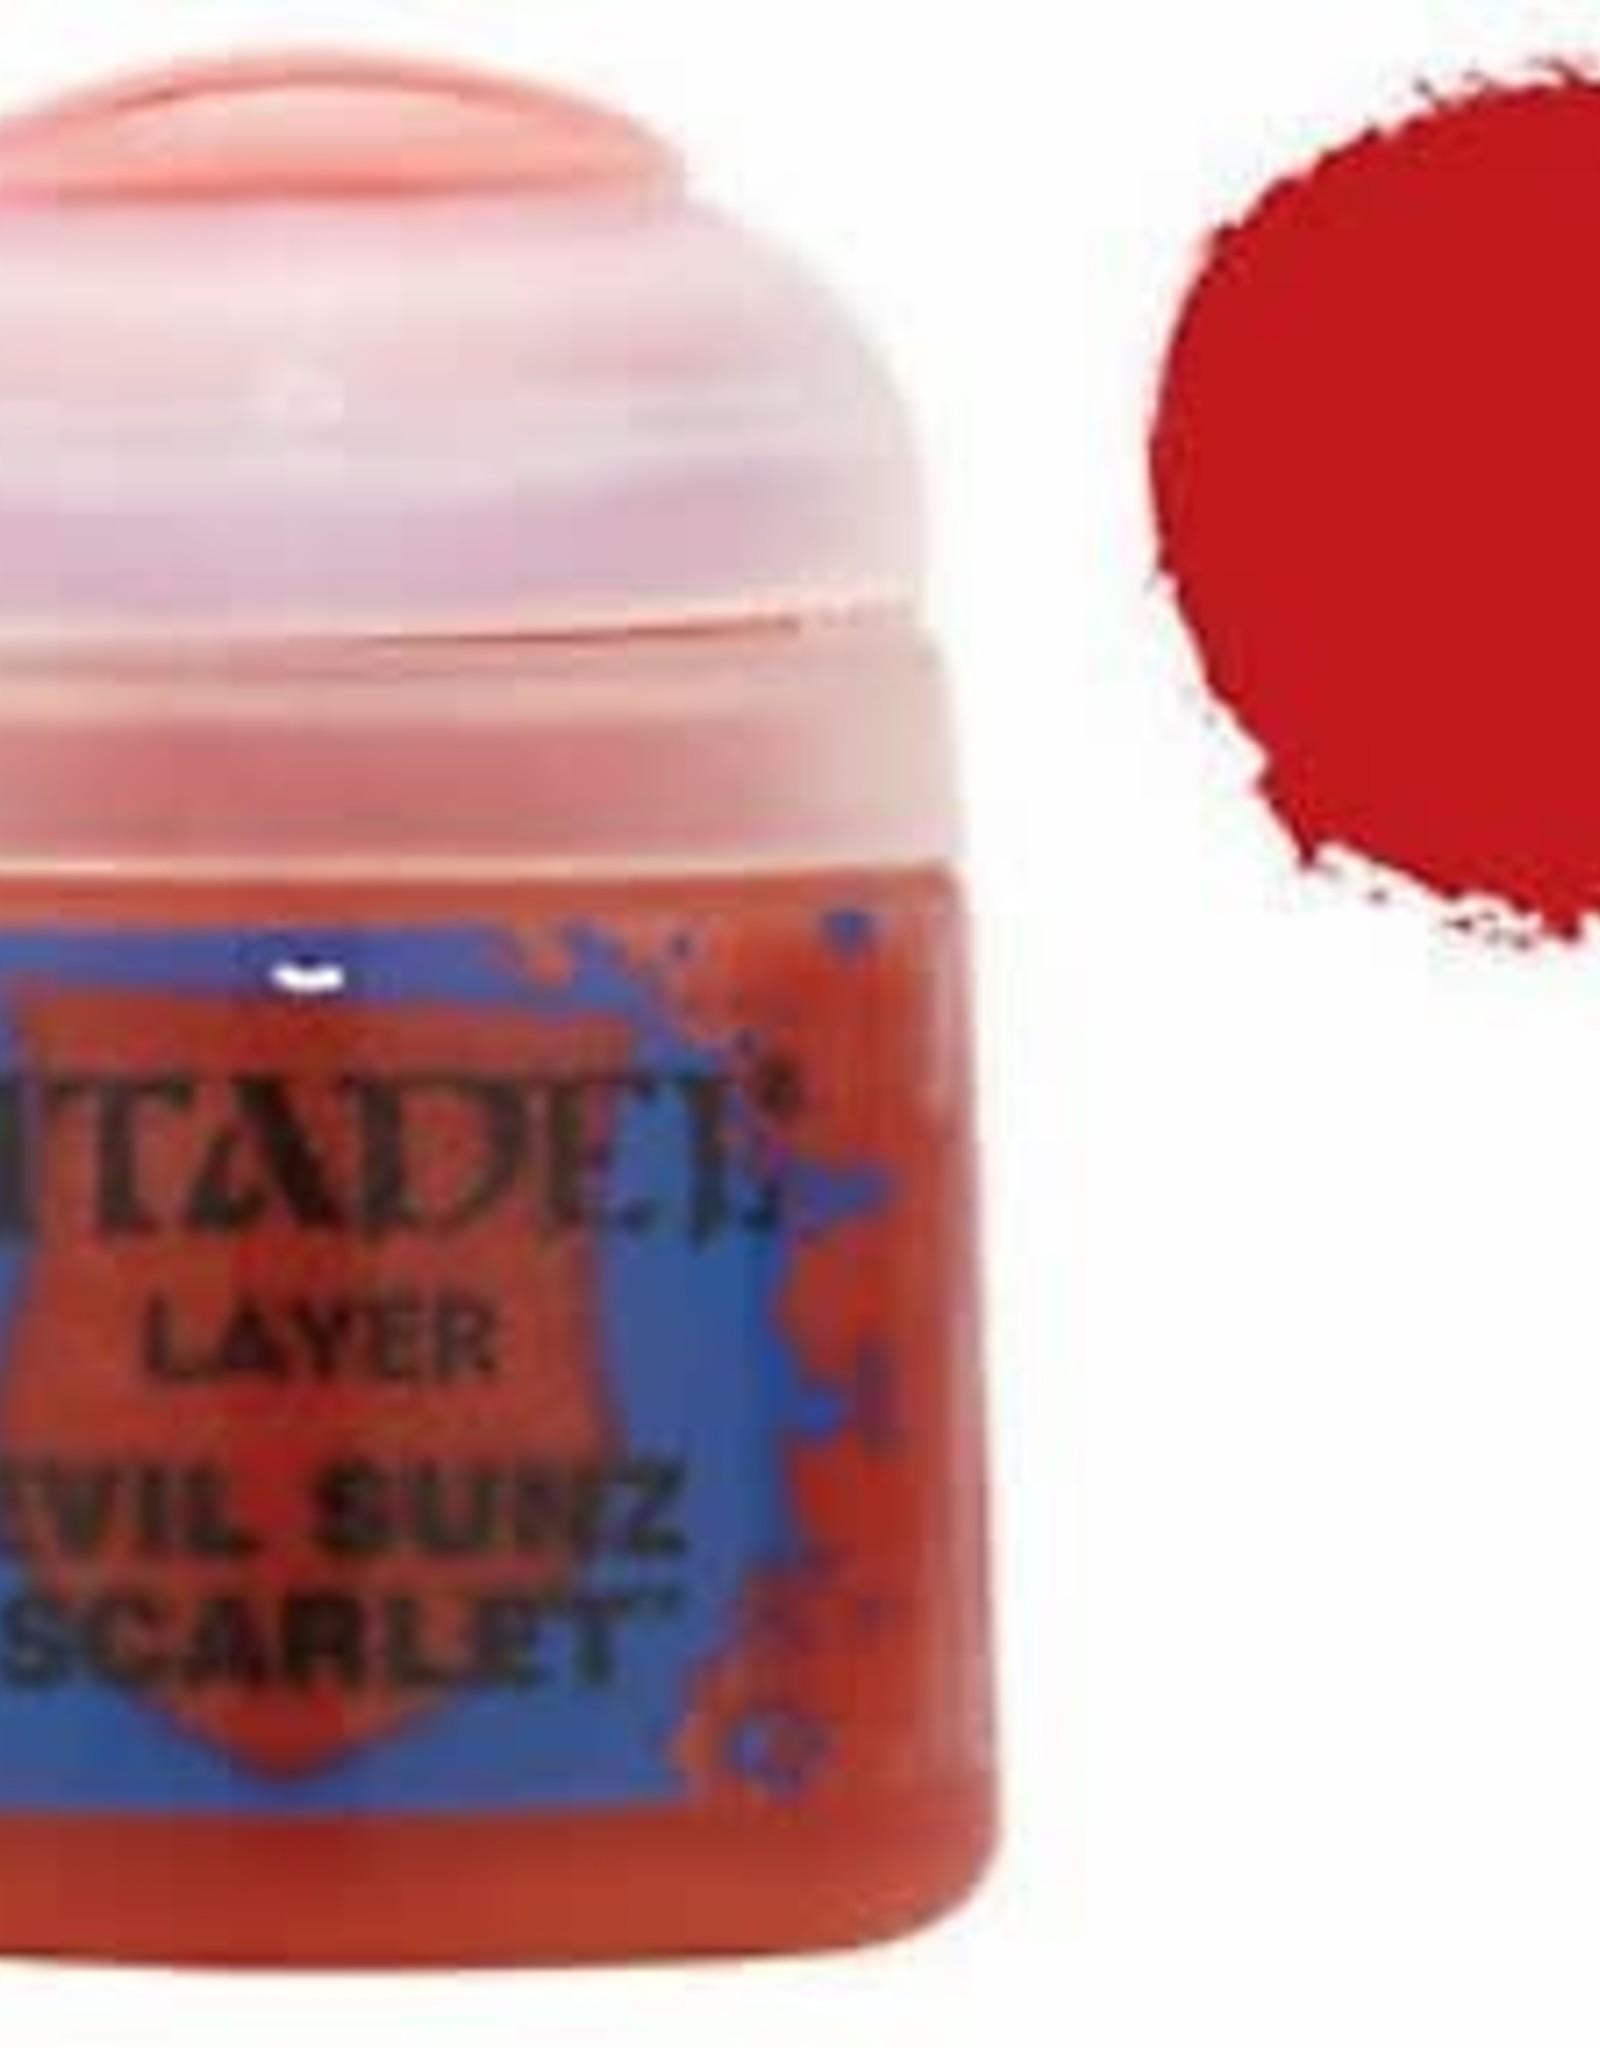 Games Workshop Citadel Paint: Layer - Evil Sunz Scarlet